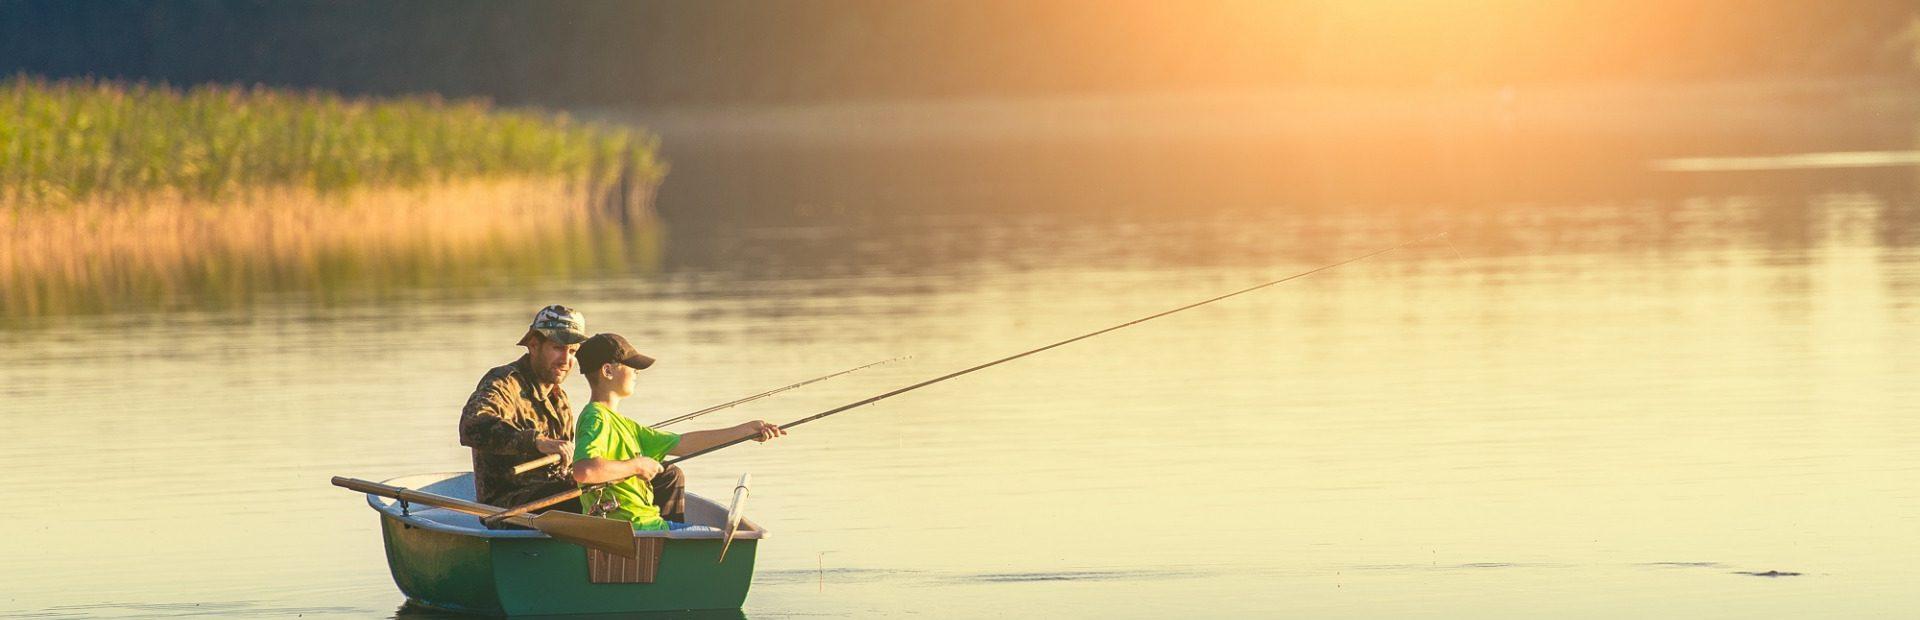 Going fishing in Pomorskie